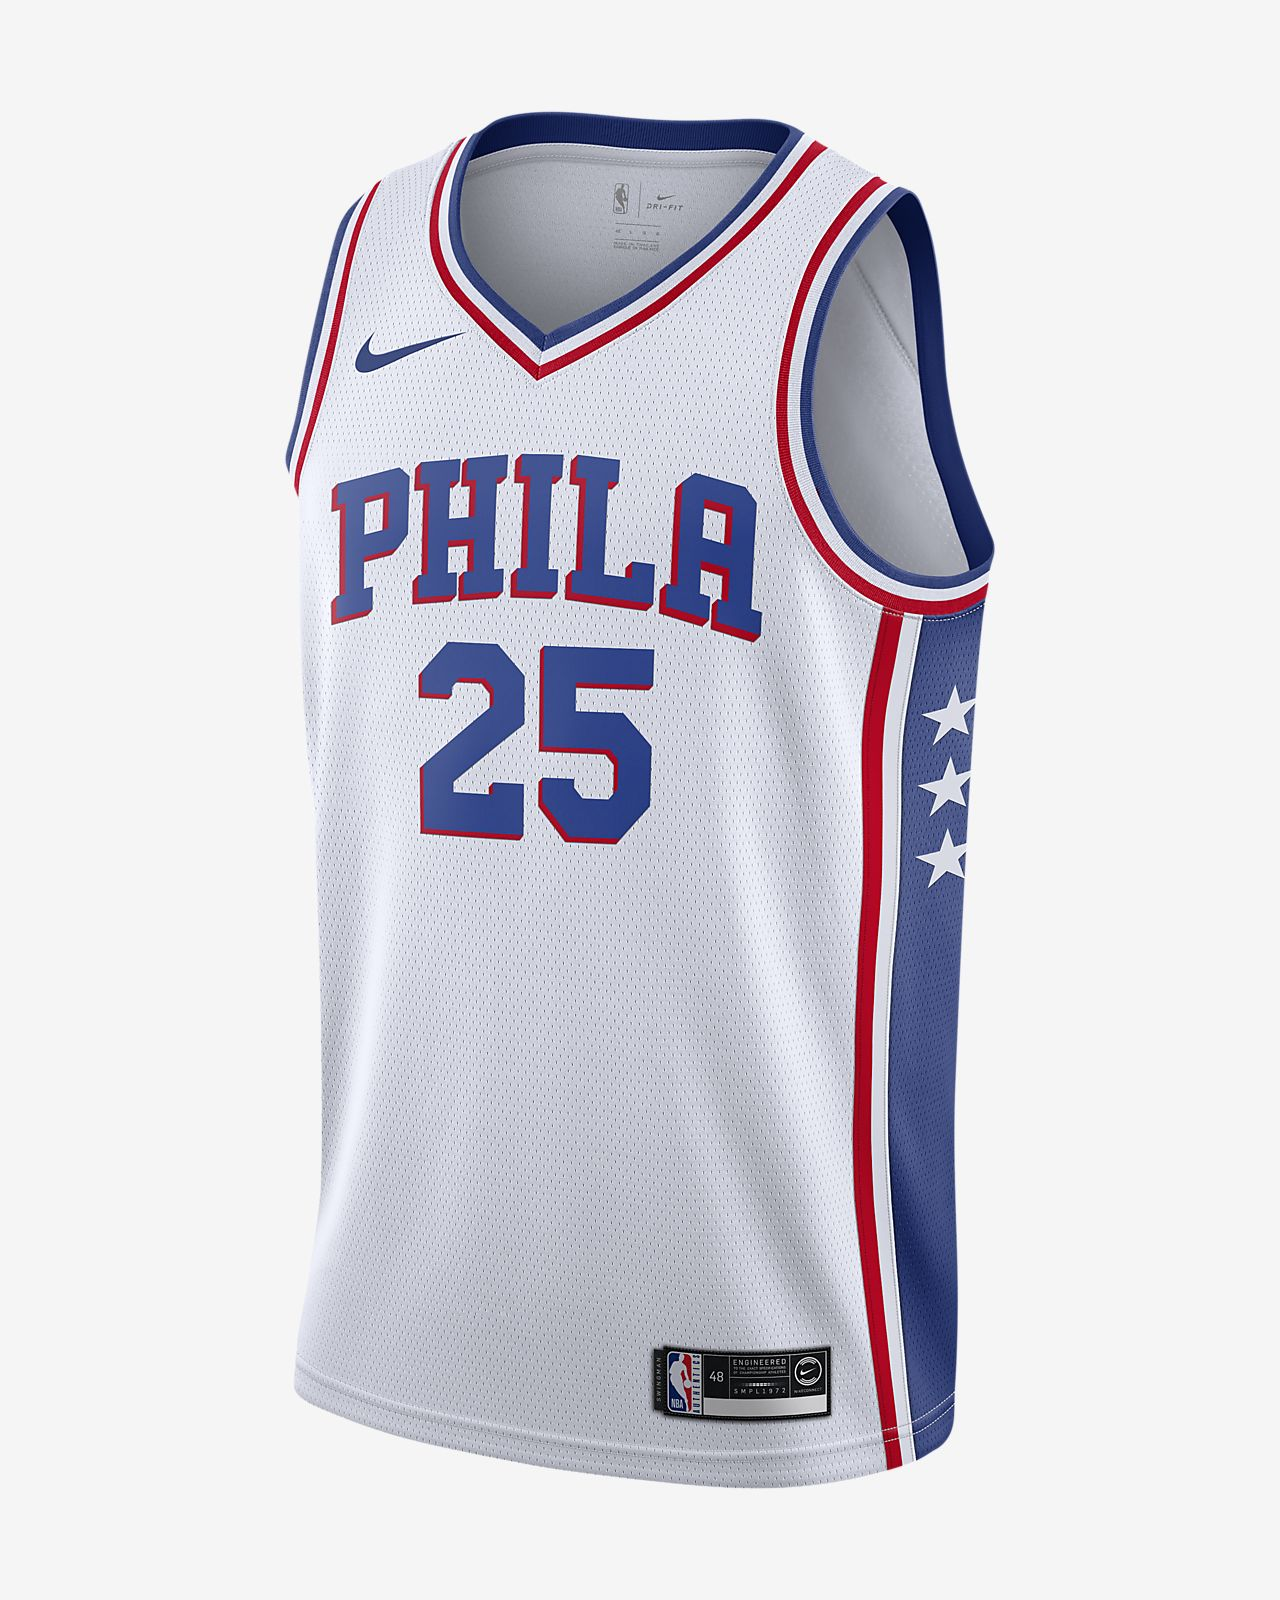 Koszulka Nike NBA Swingman Ben Simmons 76ers Association Edition